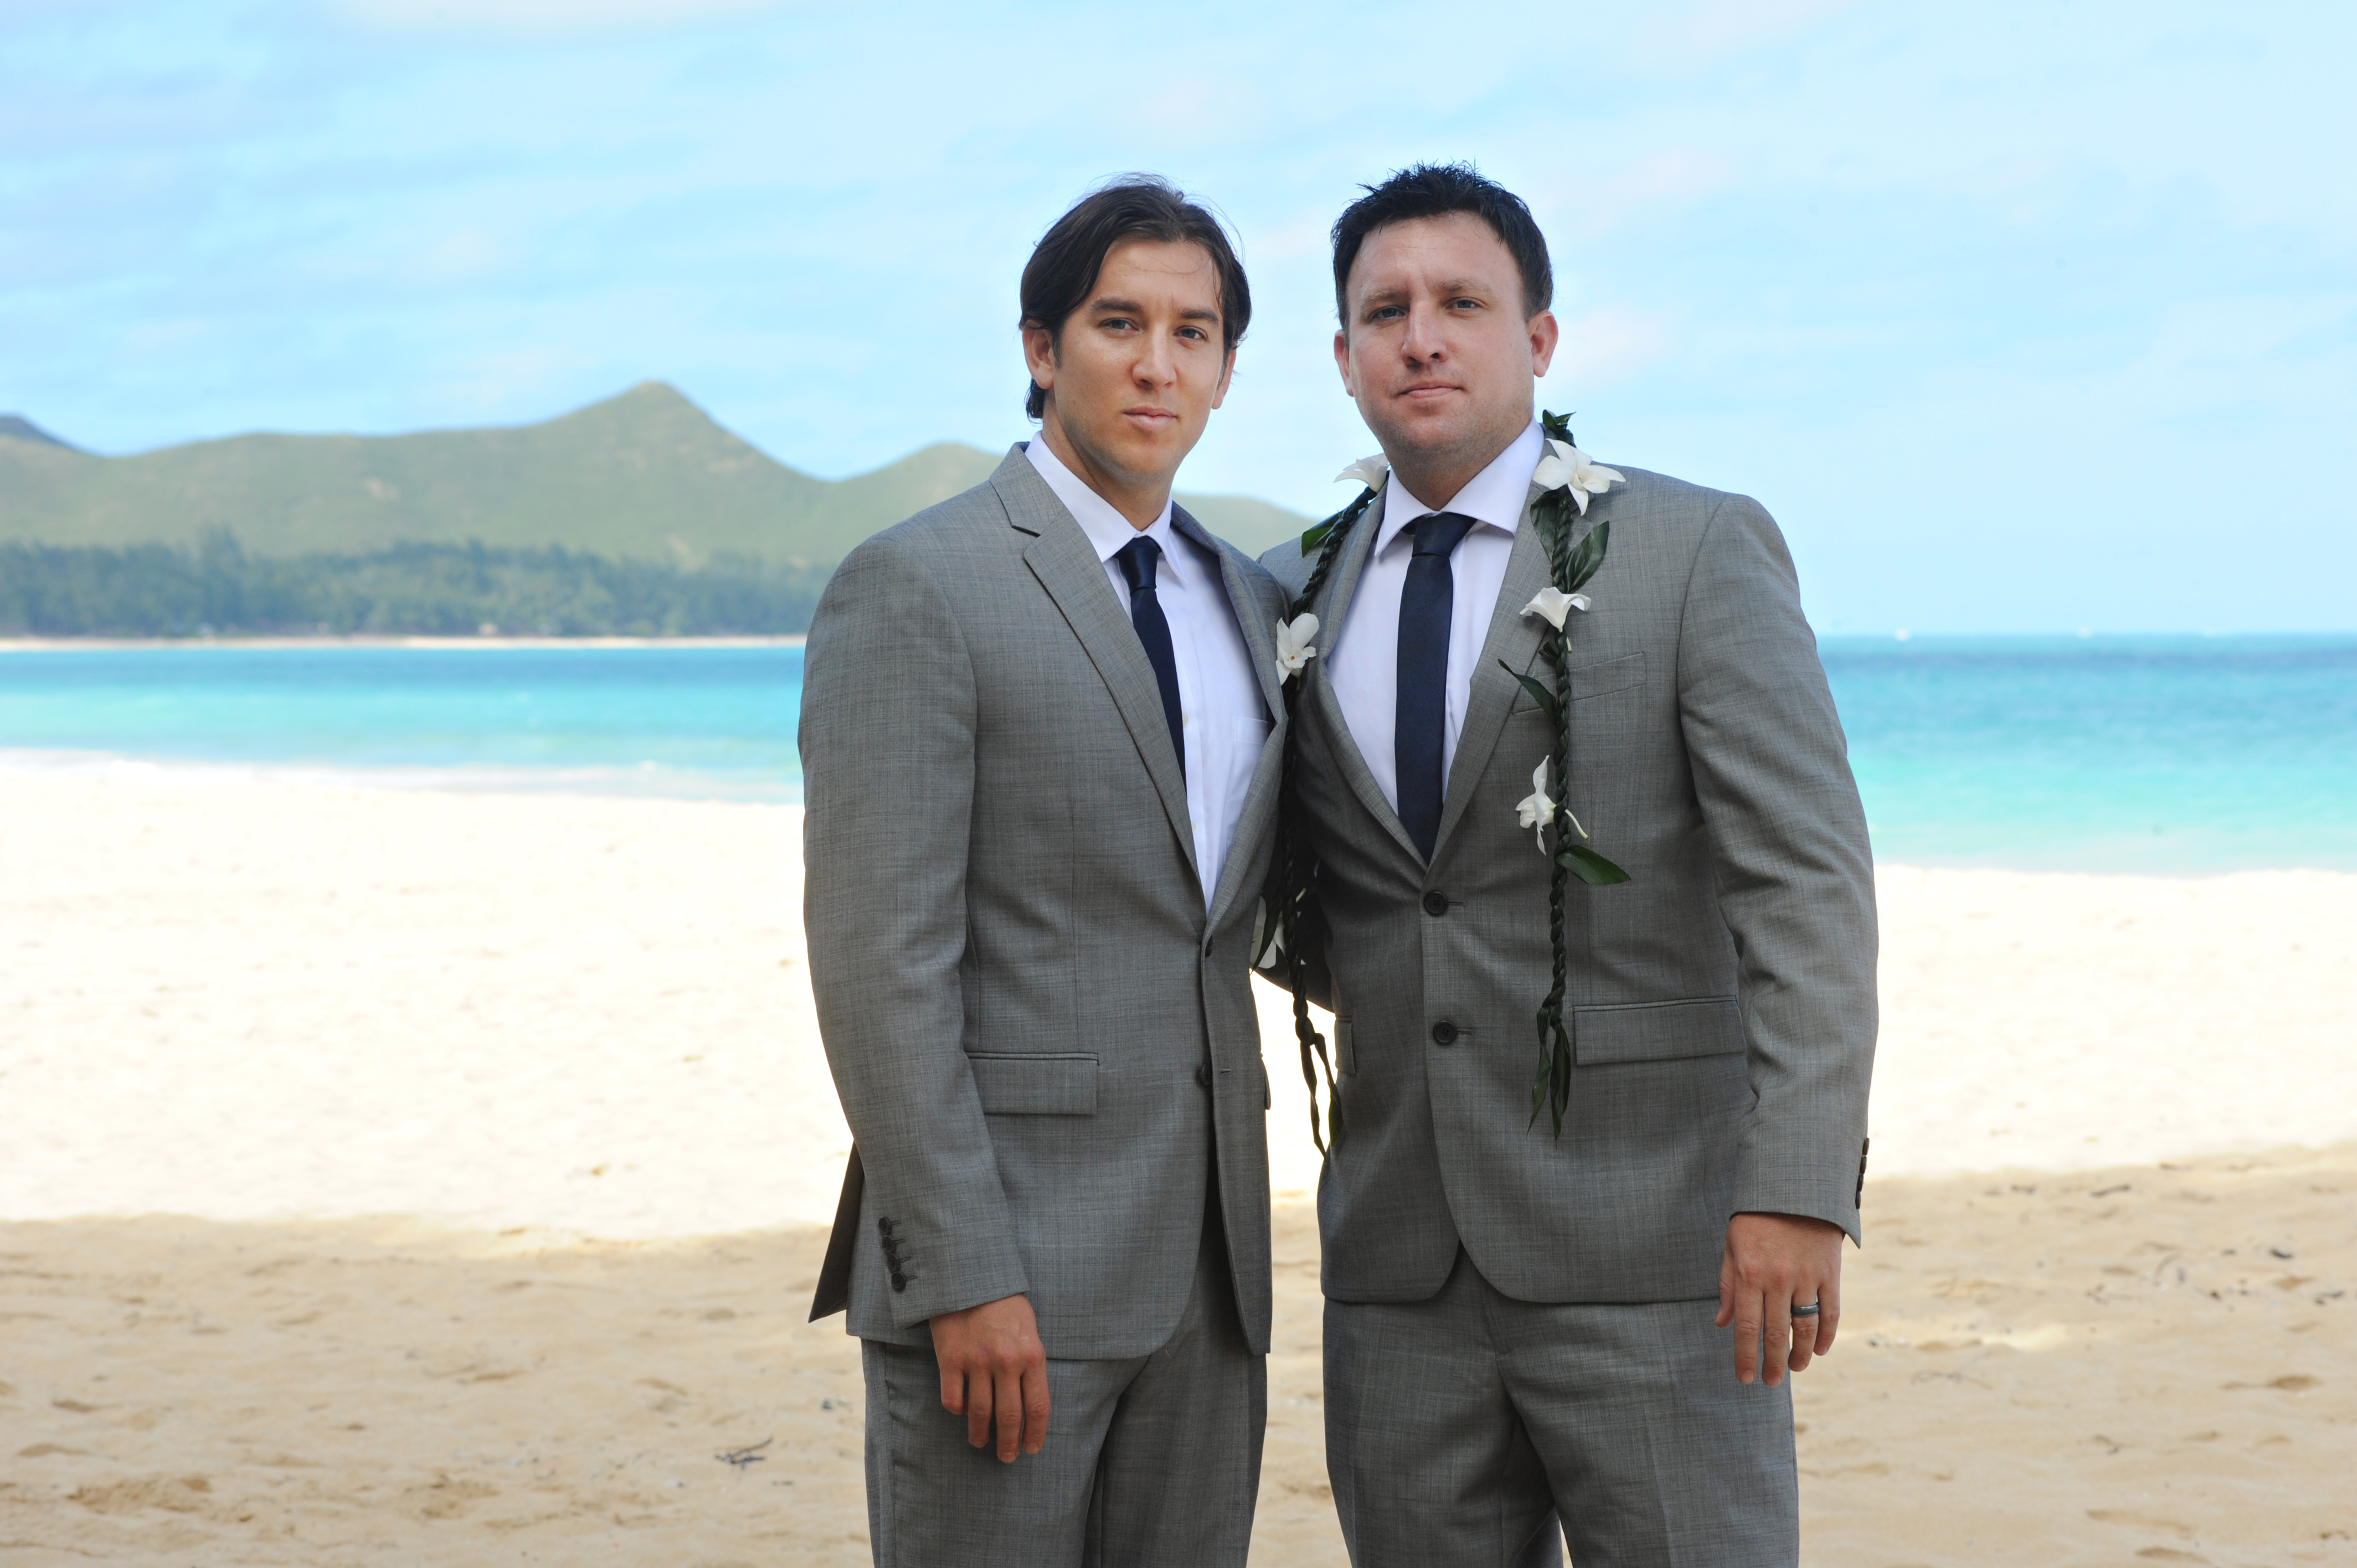 wedding In Hawaii -Bride -maids-5